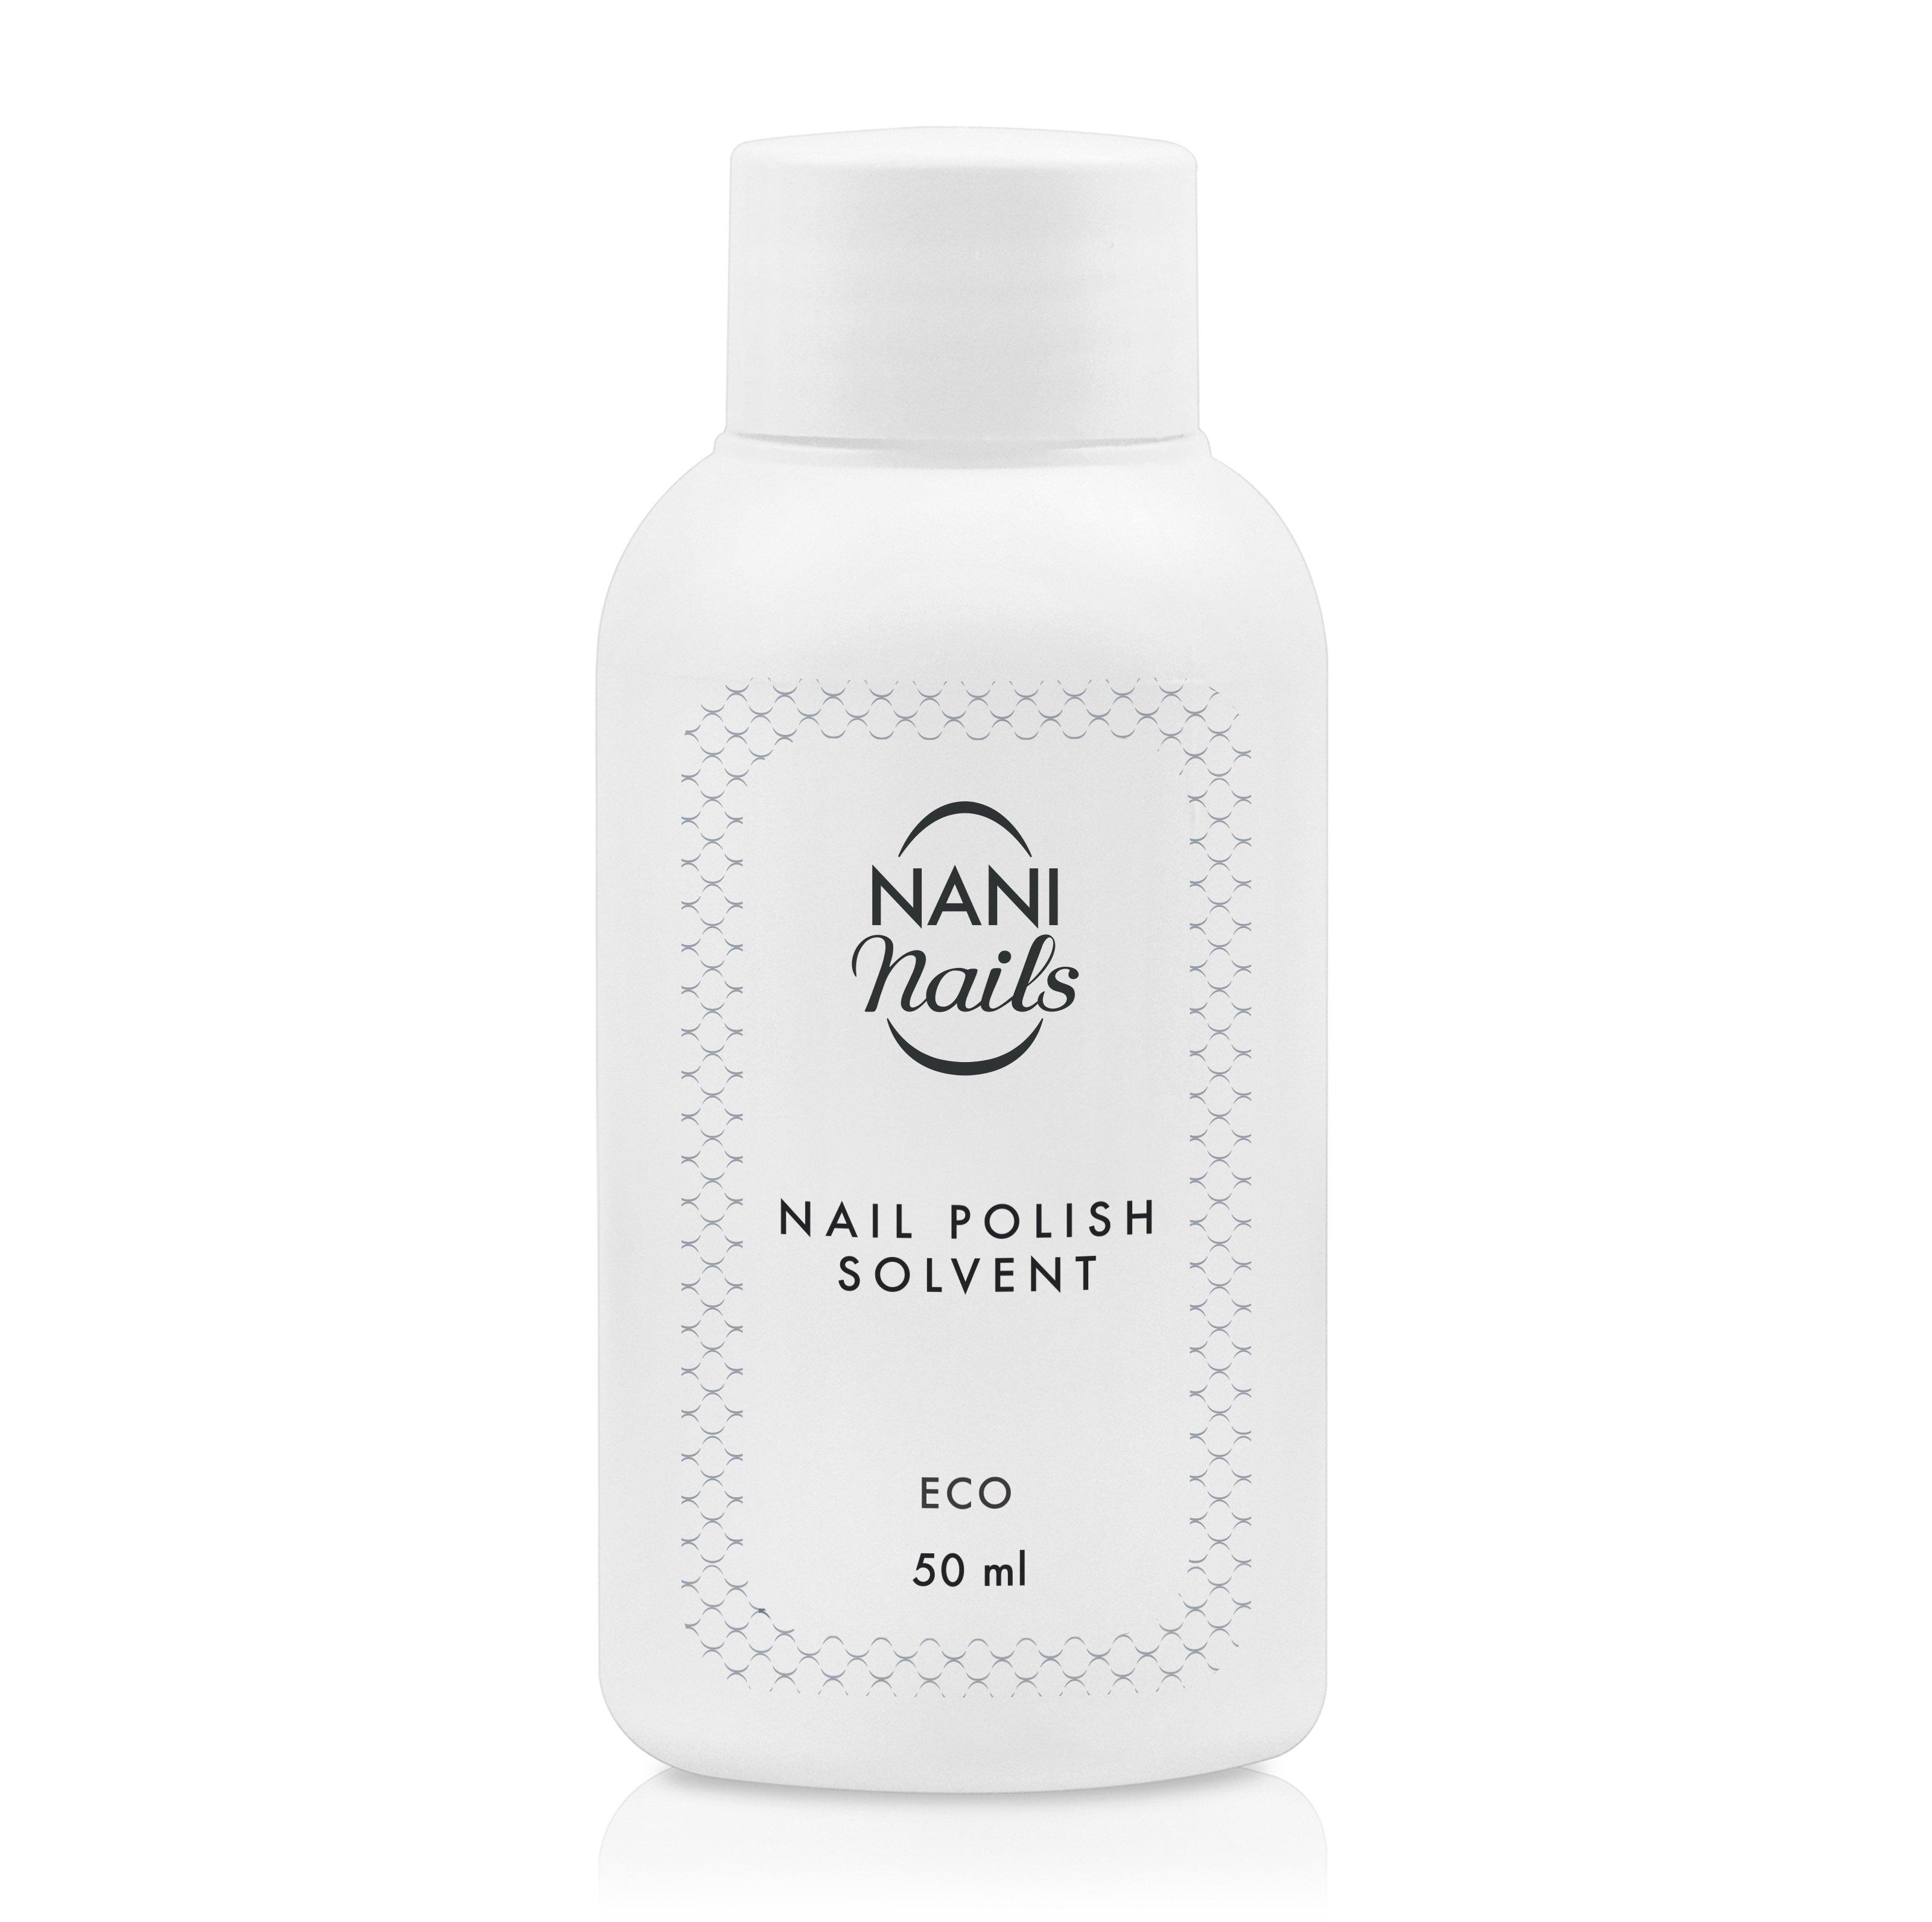 Nani Redidlo Laku Sequent Eco 50 Ml Naninails Cz